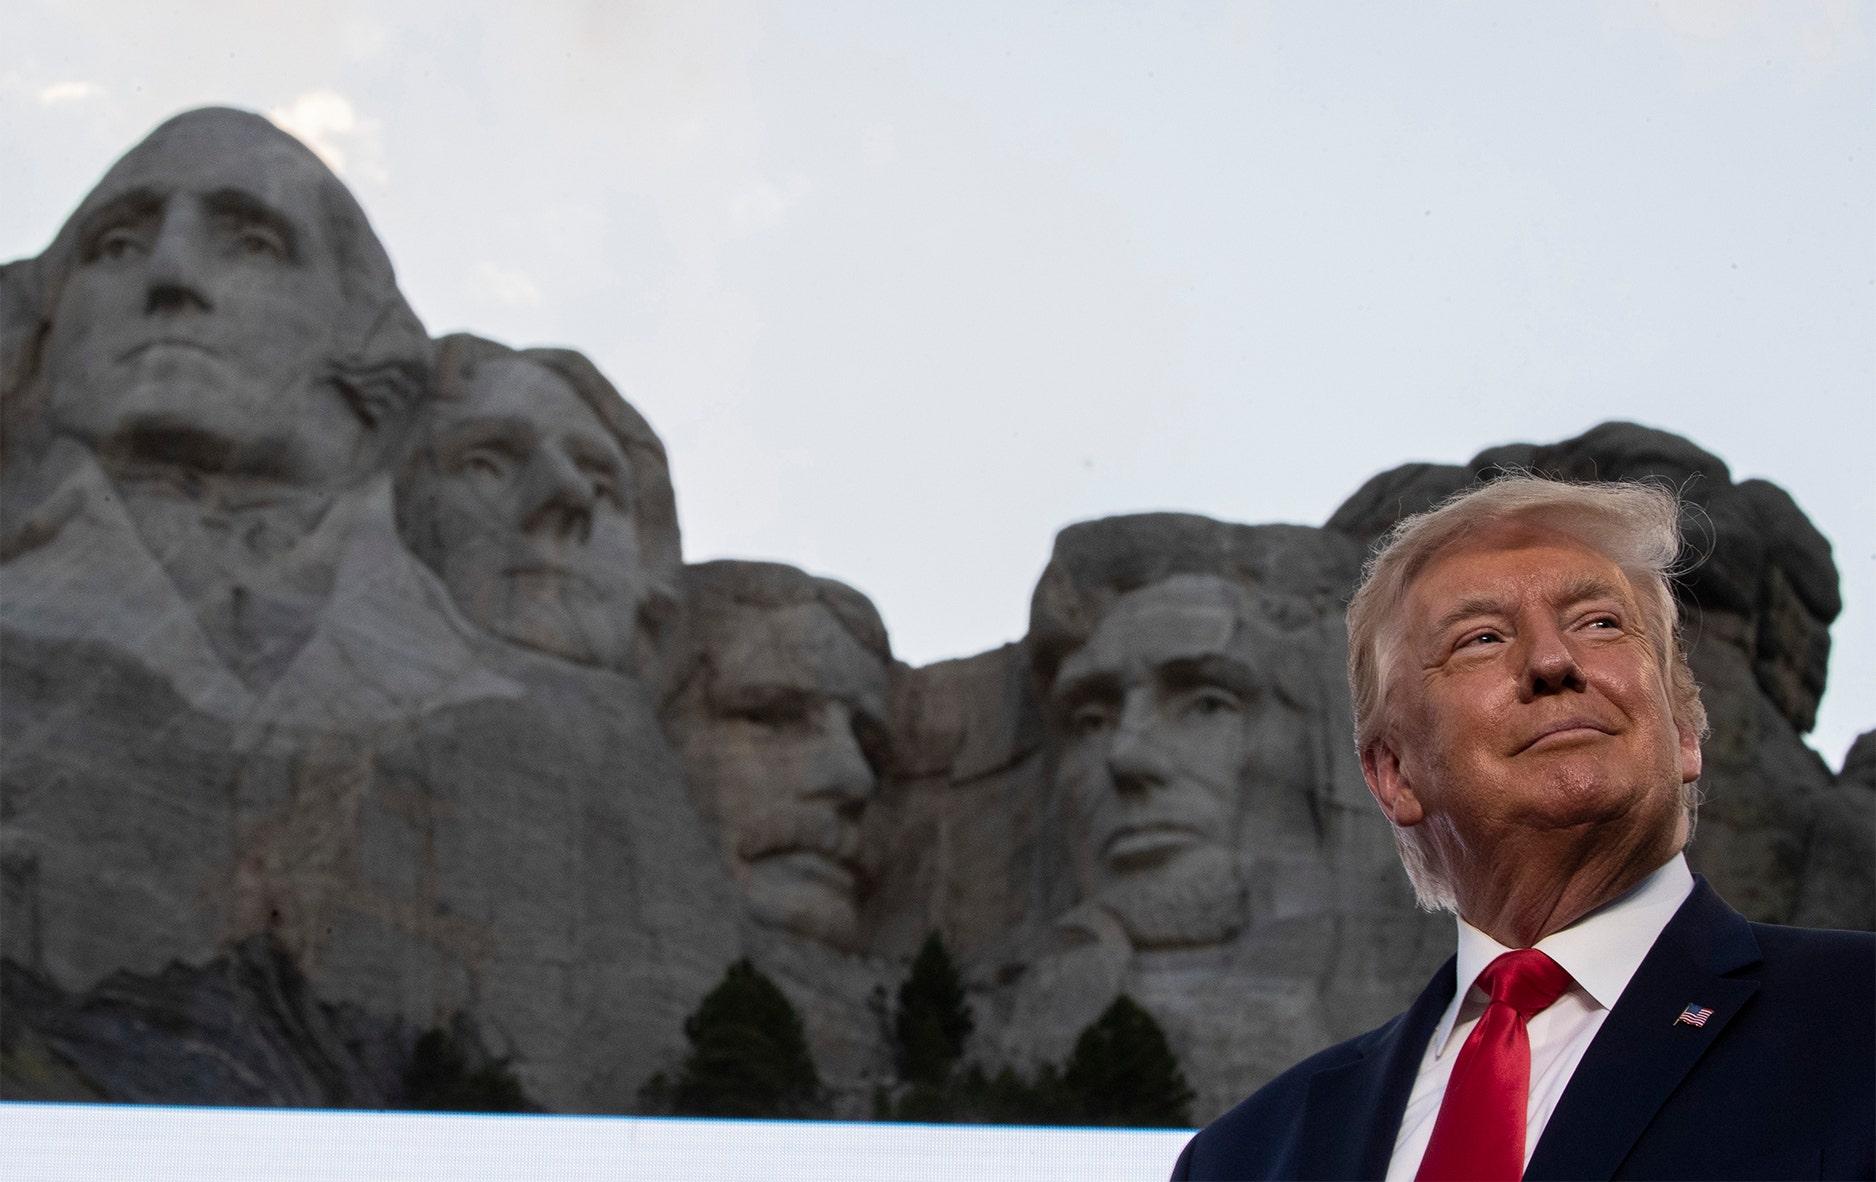 Westlake Legal Group Trump-Mt-Rushmore-Slideshow-04 PHOTOS: President Trump's Mount Rushmore speech kicks off 4th of July celebrations fox-news/us/personal-freedoms/proud-american fox-news/us fox-news/person/donald-trump fox news fnc/us fnc c95c9261-fe1d-56d7-9cb3-c4d9f2cfeb43 article